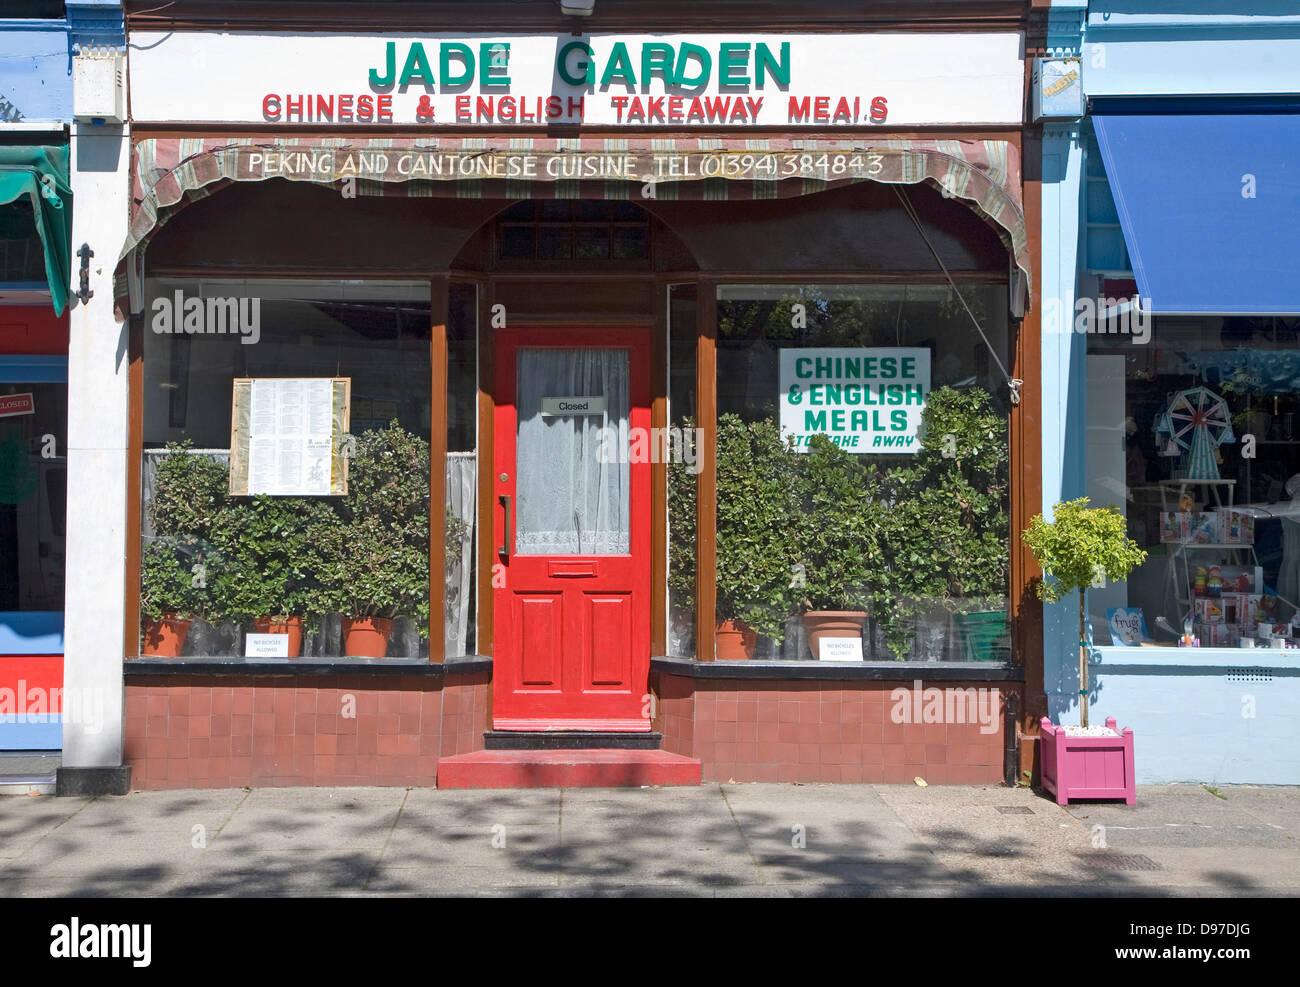 Giardino di giada cinese e inglese i pasti da asporto woodbridge